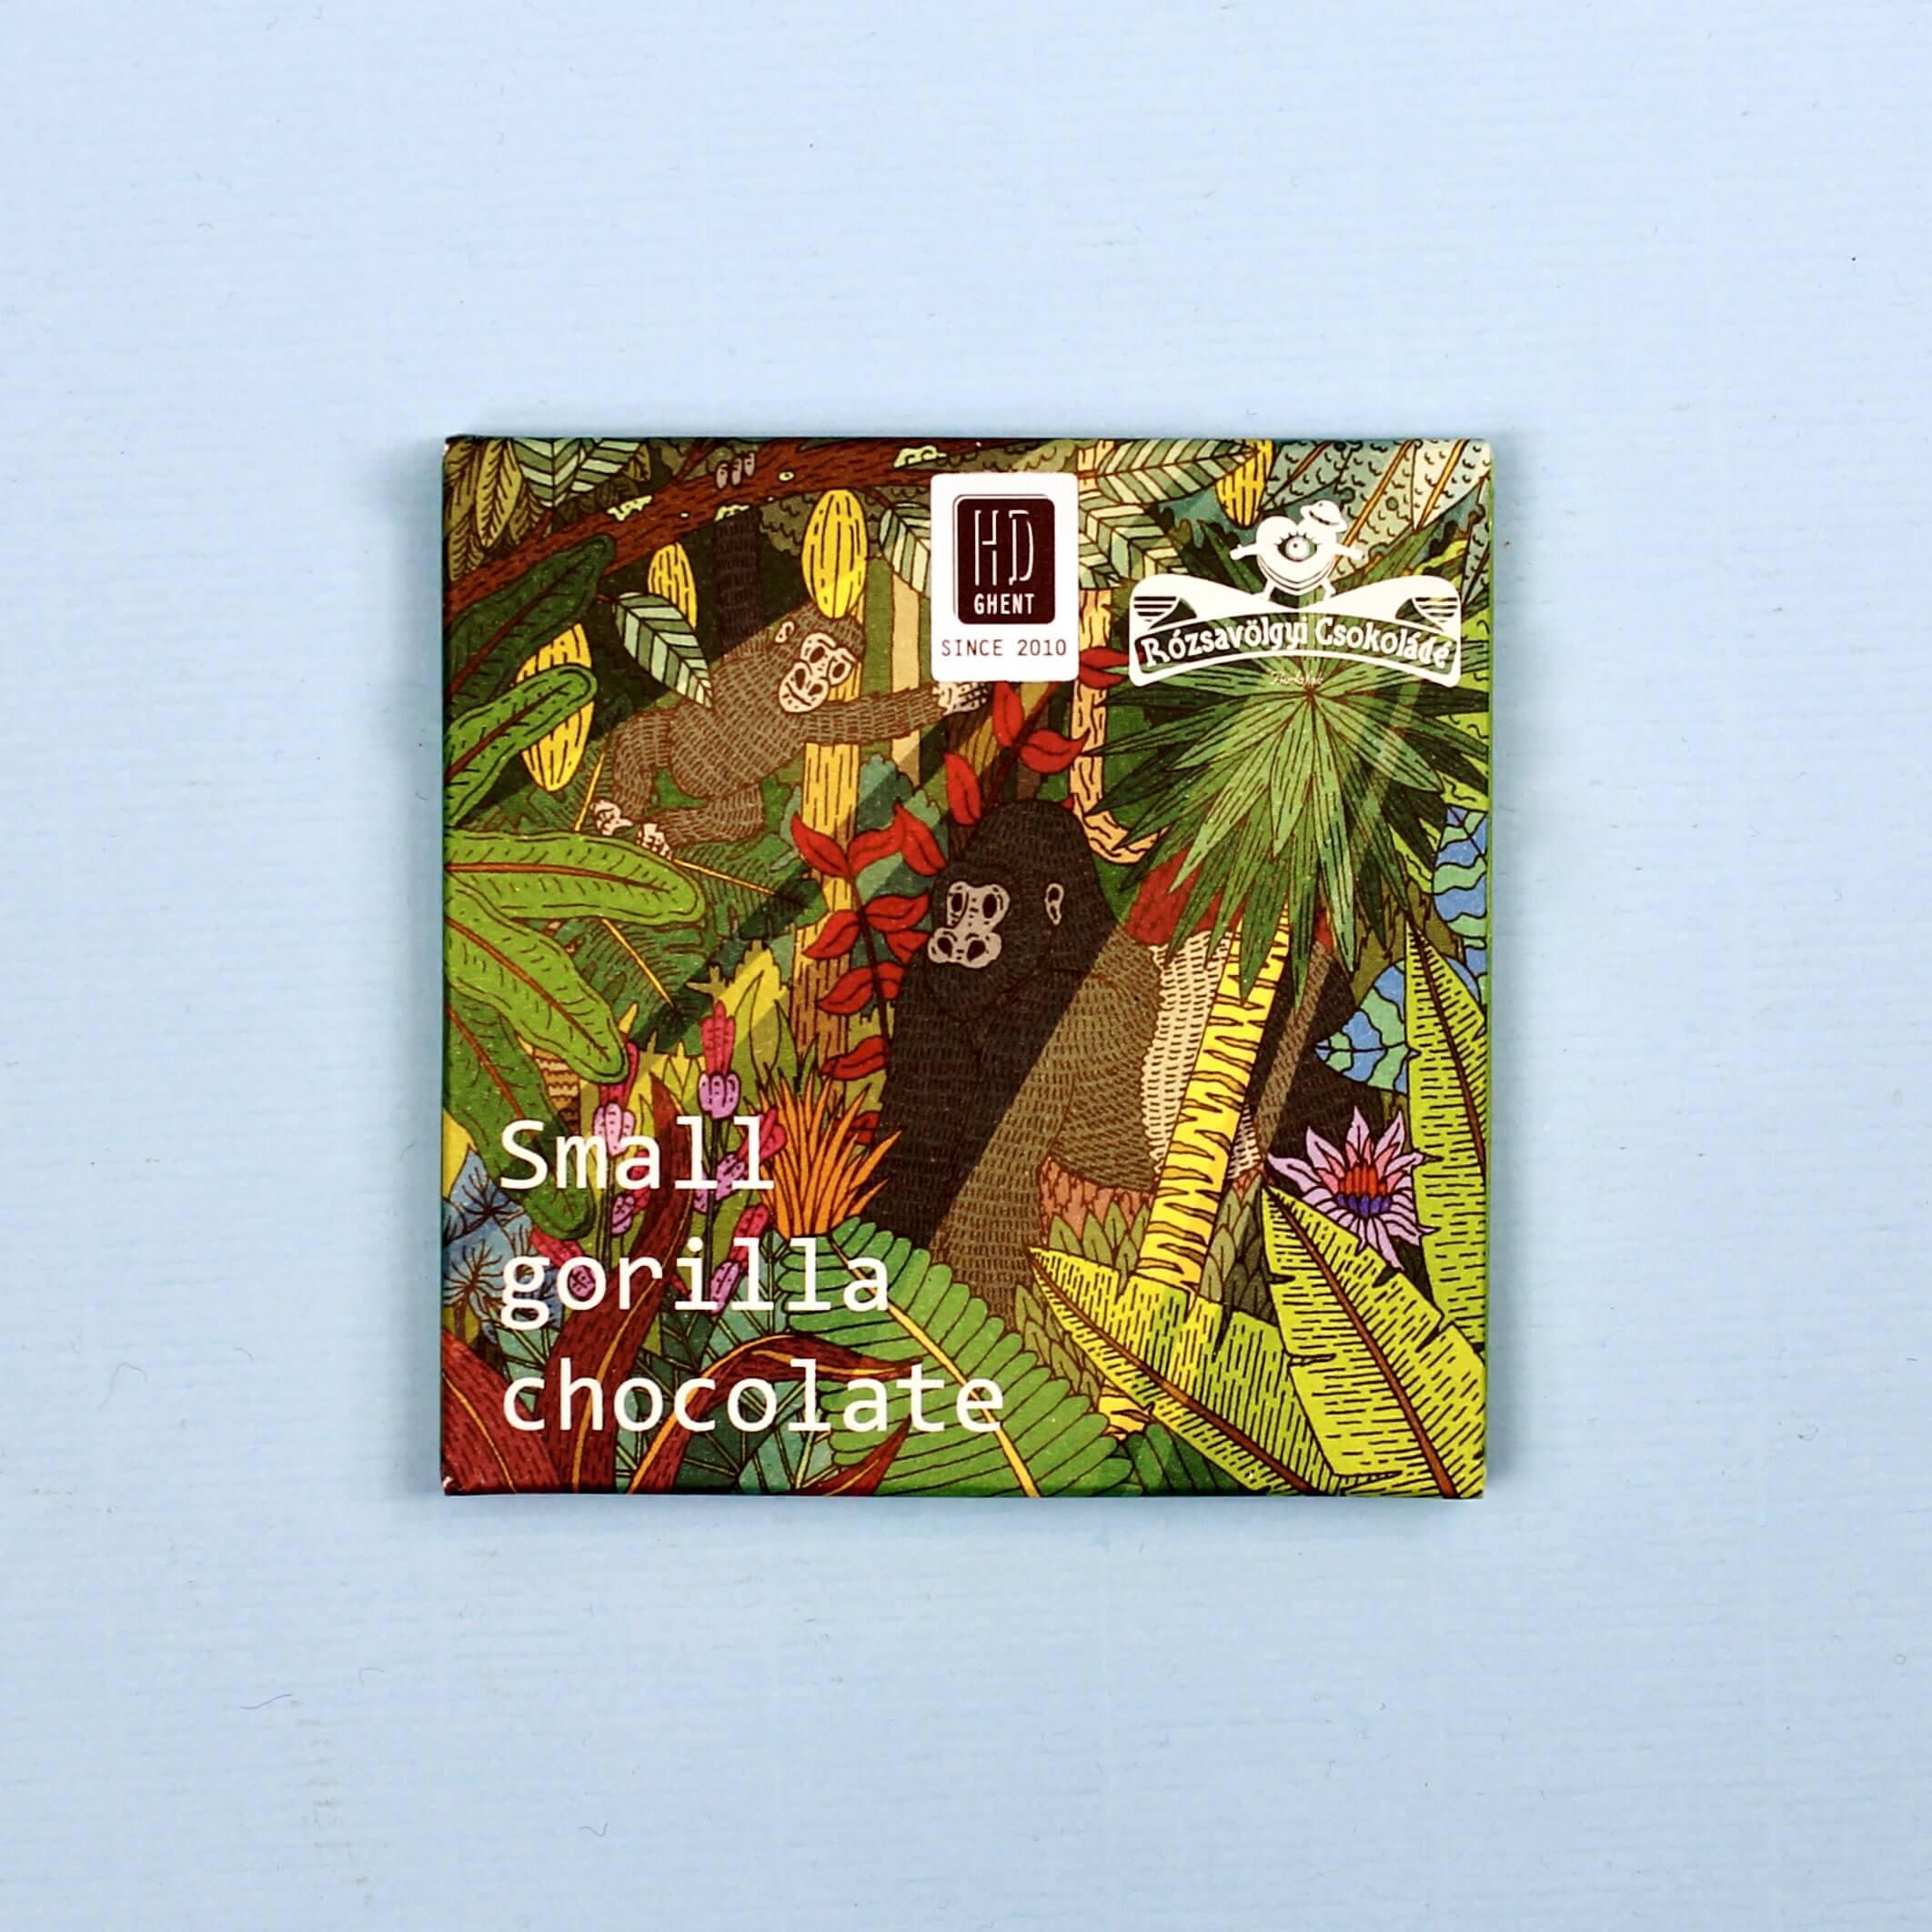 hd ghent rozsavolgyi csokolade small gorilla chocolate 75 tanzania